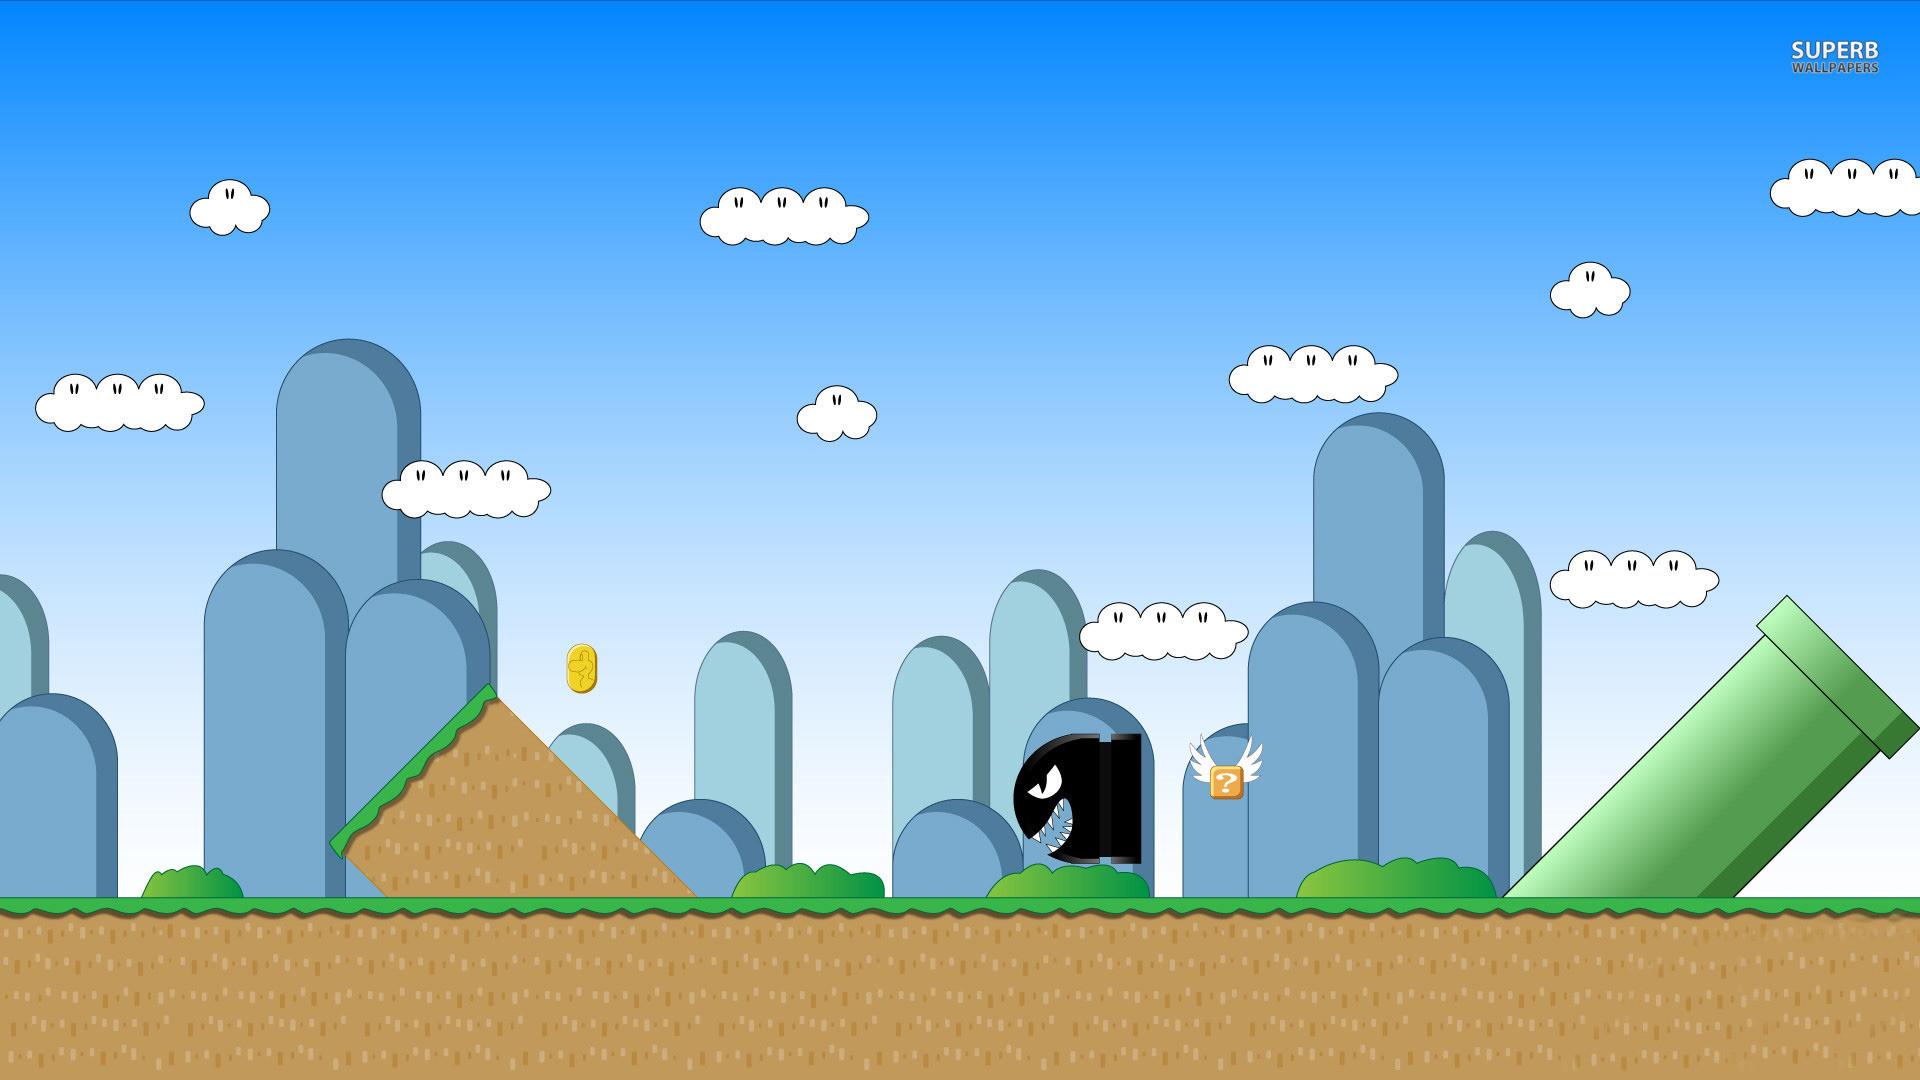 Super Mario HD Backgrounds | PixelsTalk.Net